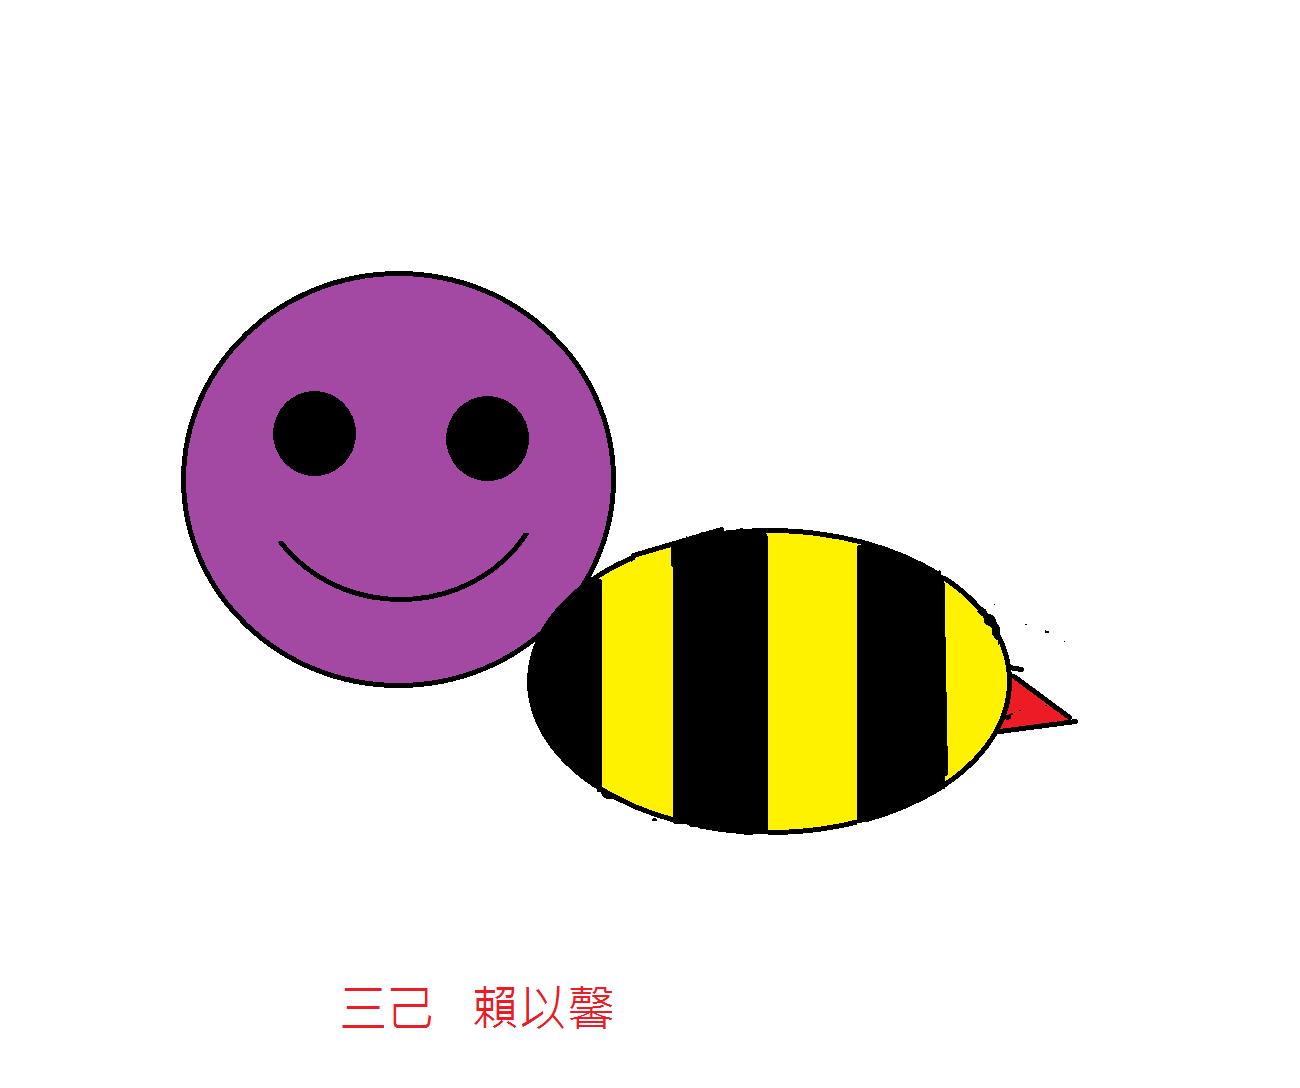 306_29_bee_27